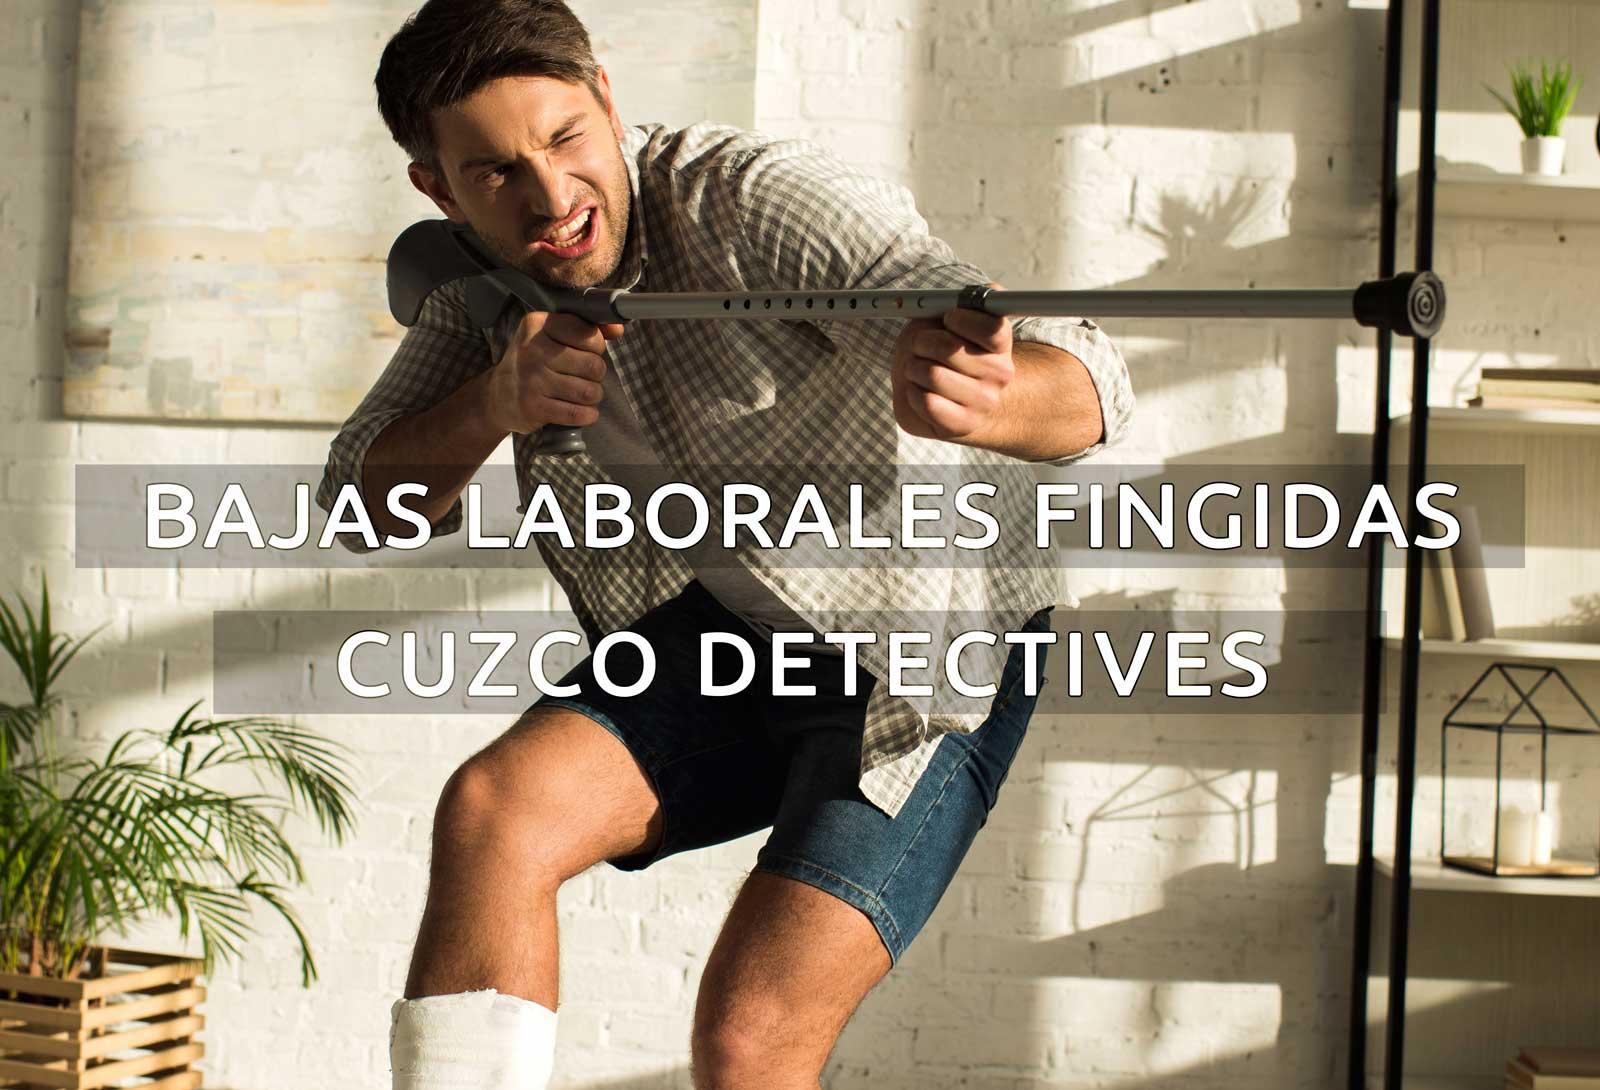 detectives bajas laborales